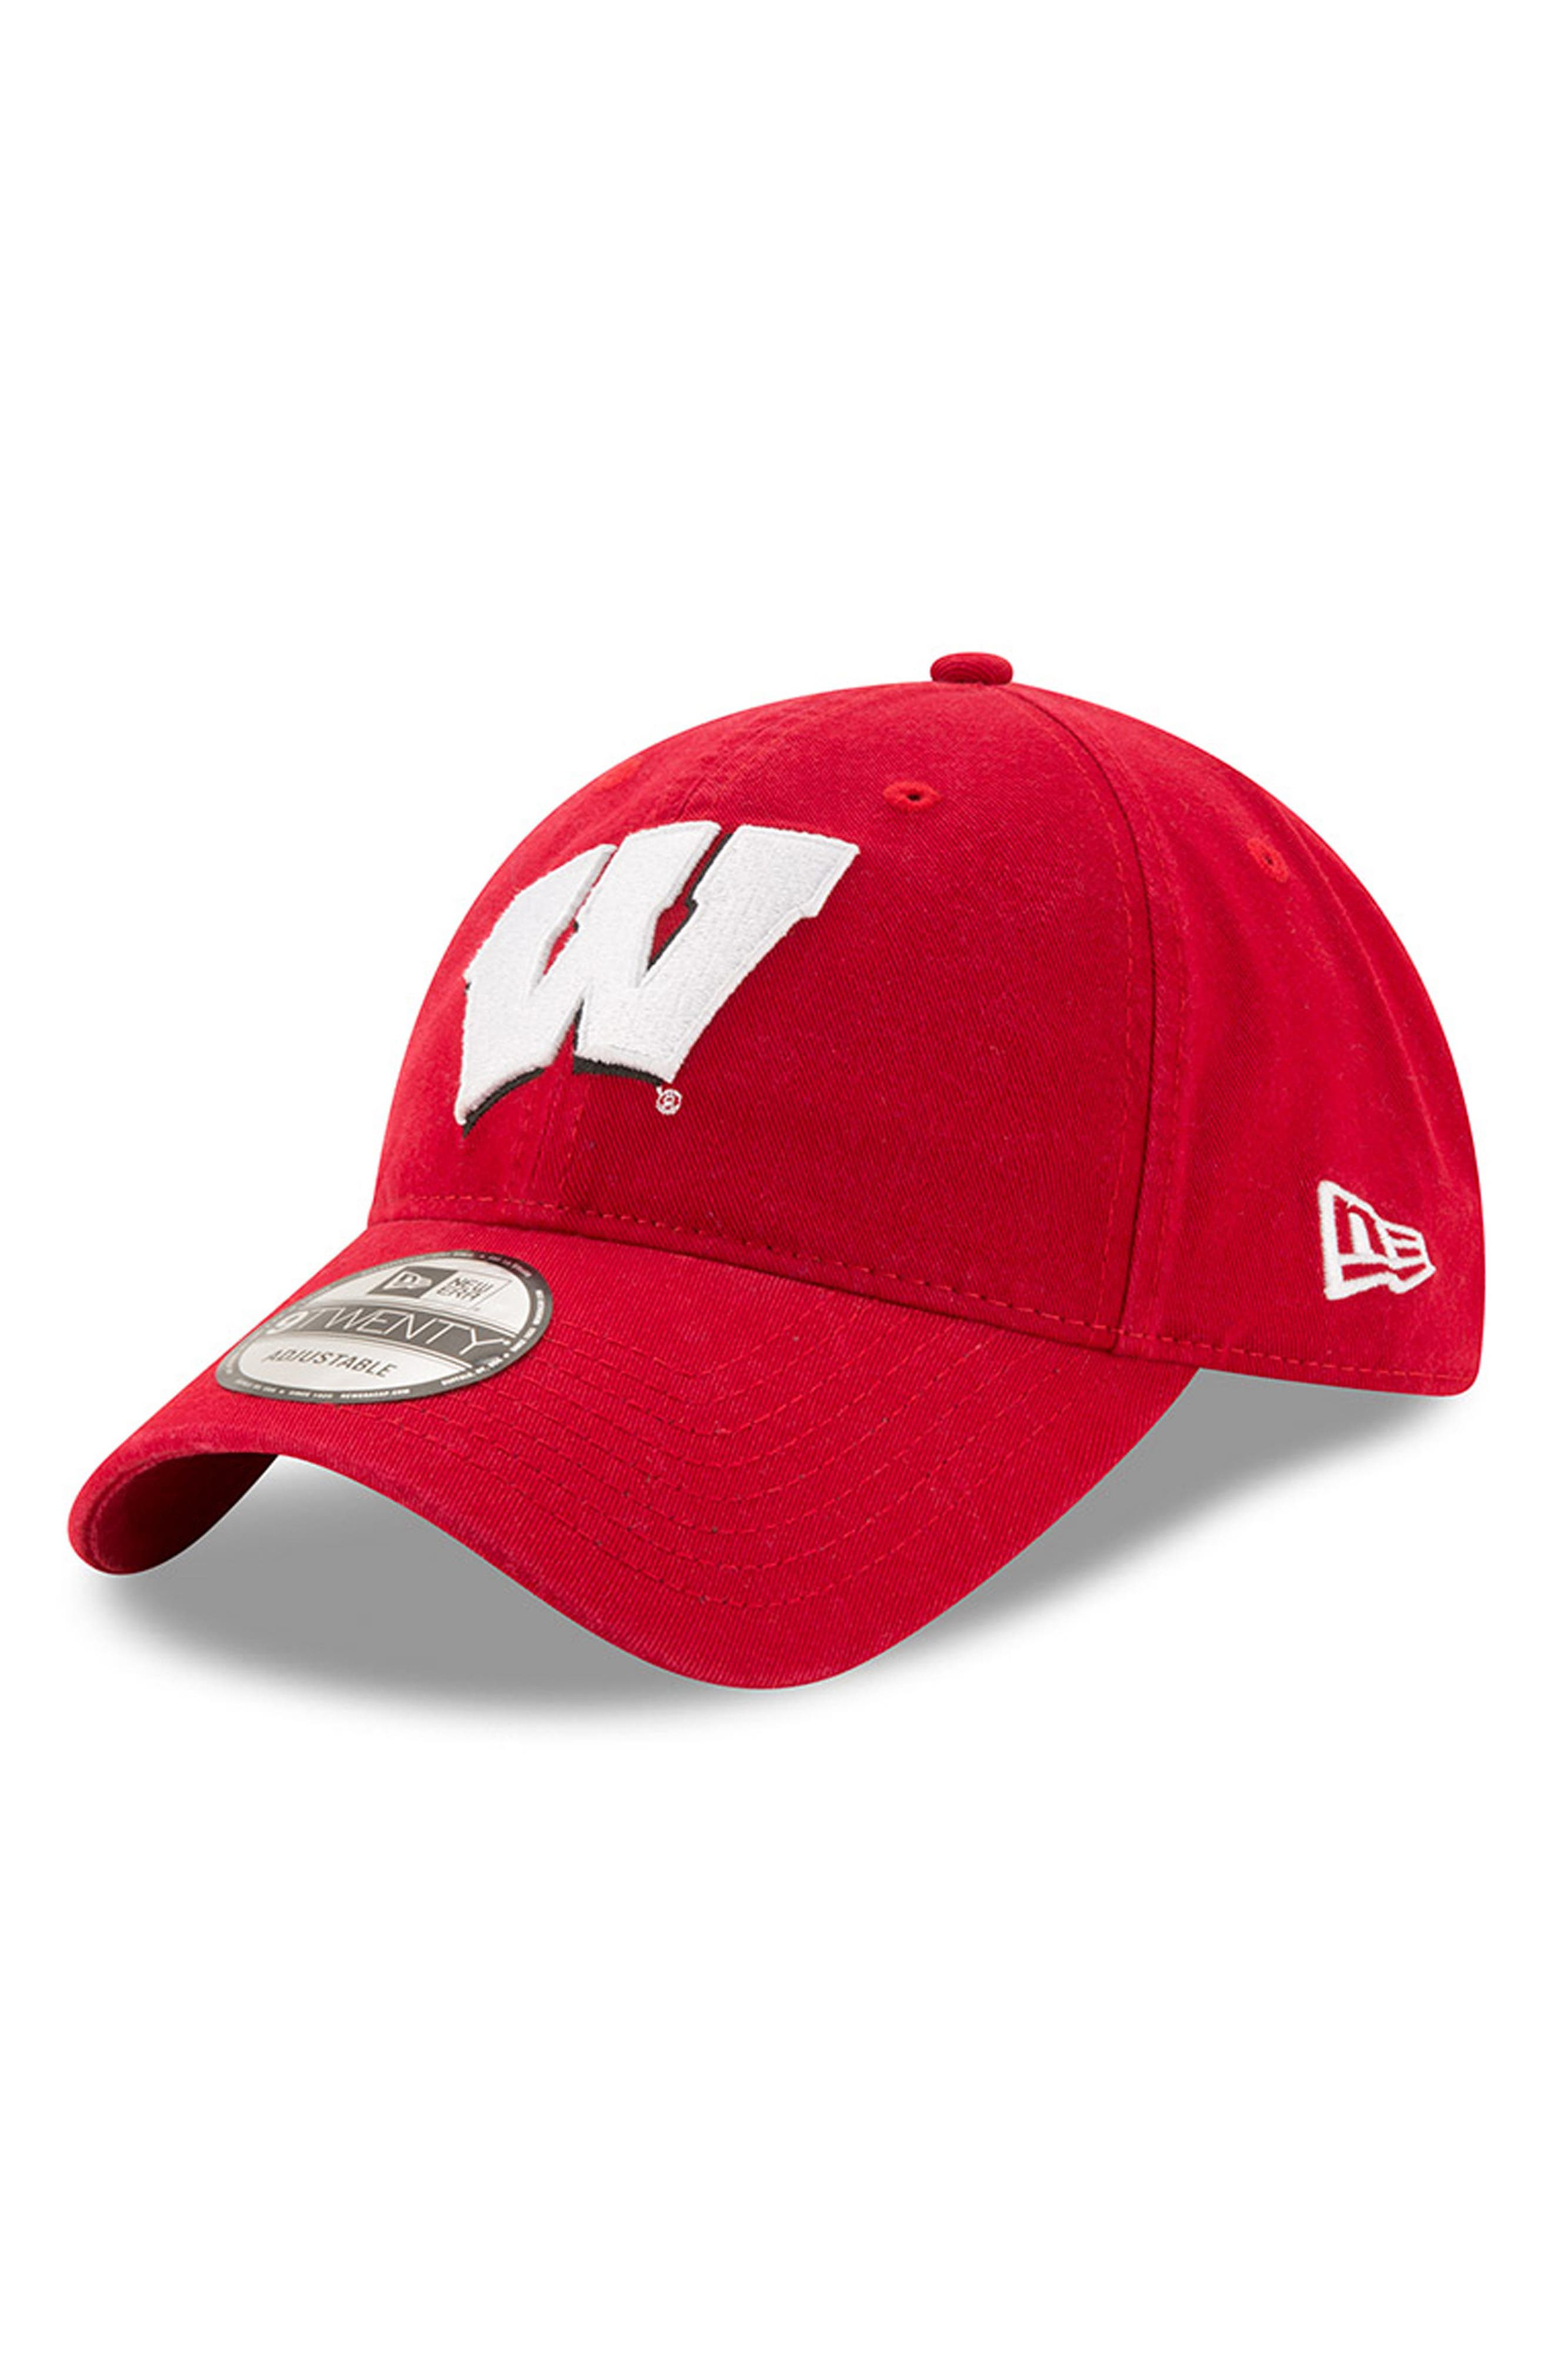 Main Image - New Era Collegiate Core Classic - Wisconsin Badgers Baseball Cap